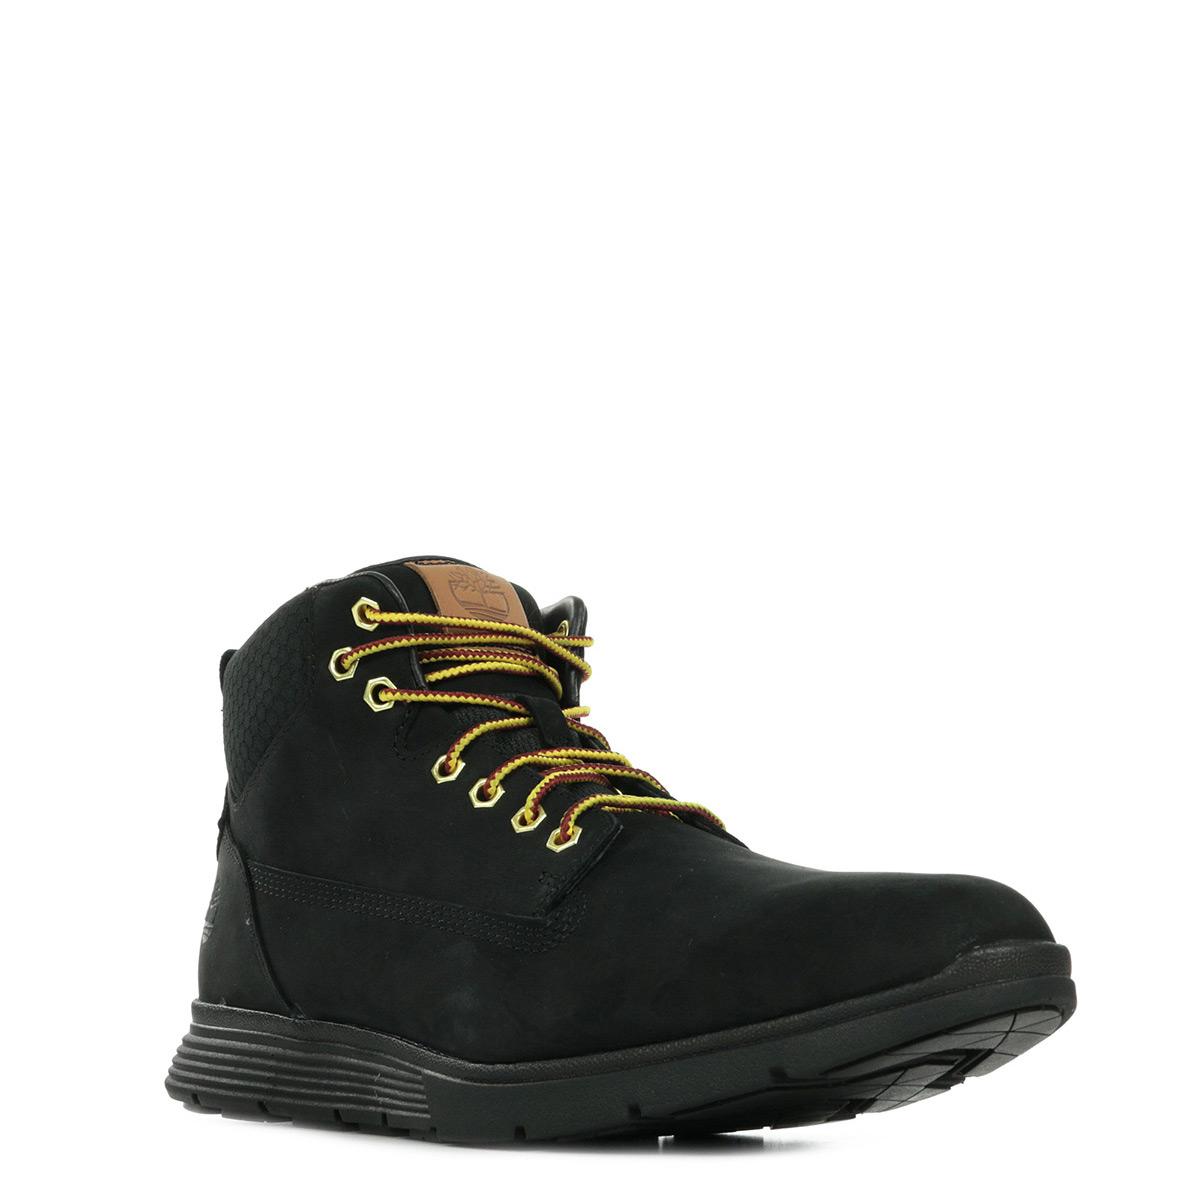 Timberland Killington Chukka Black Nubuck CA19UK, Boots homme